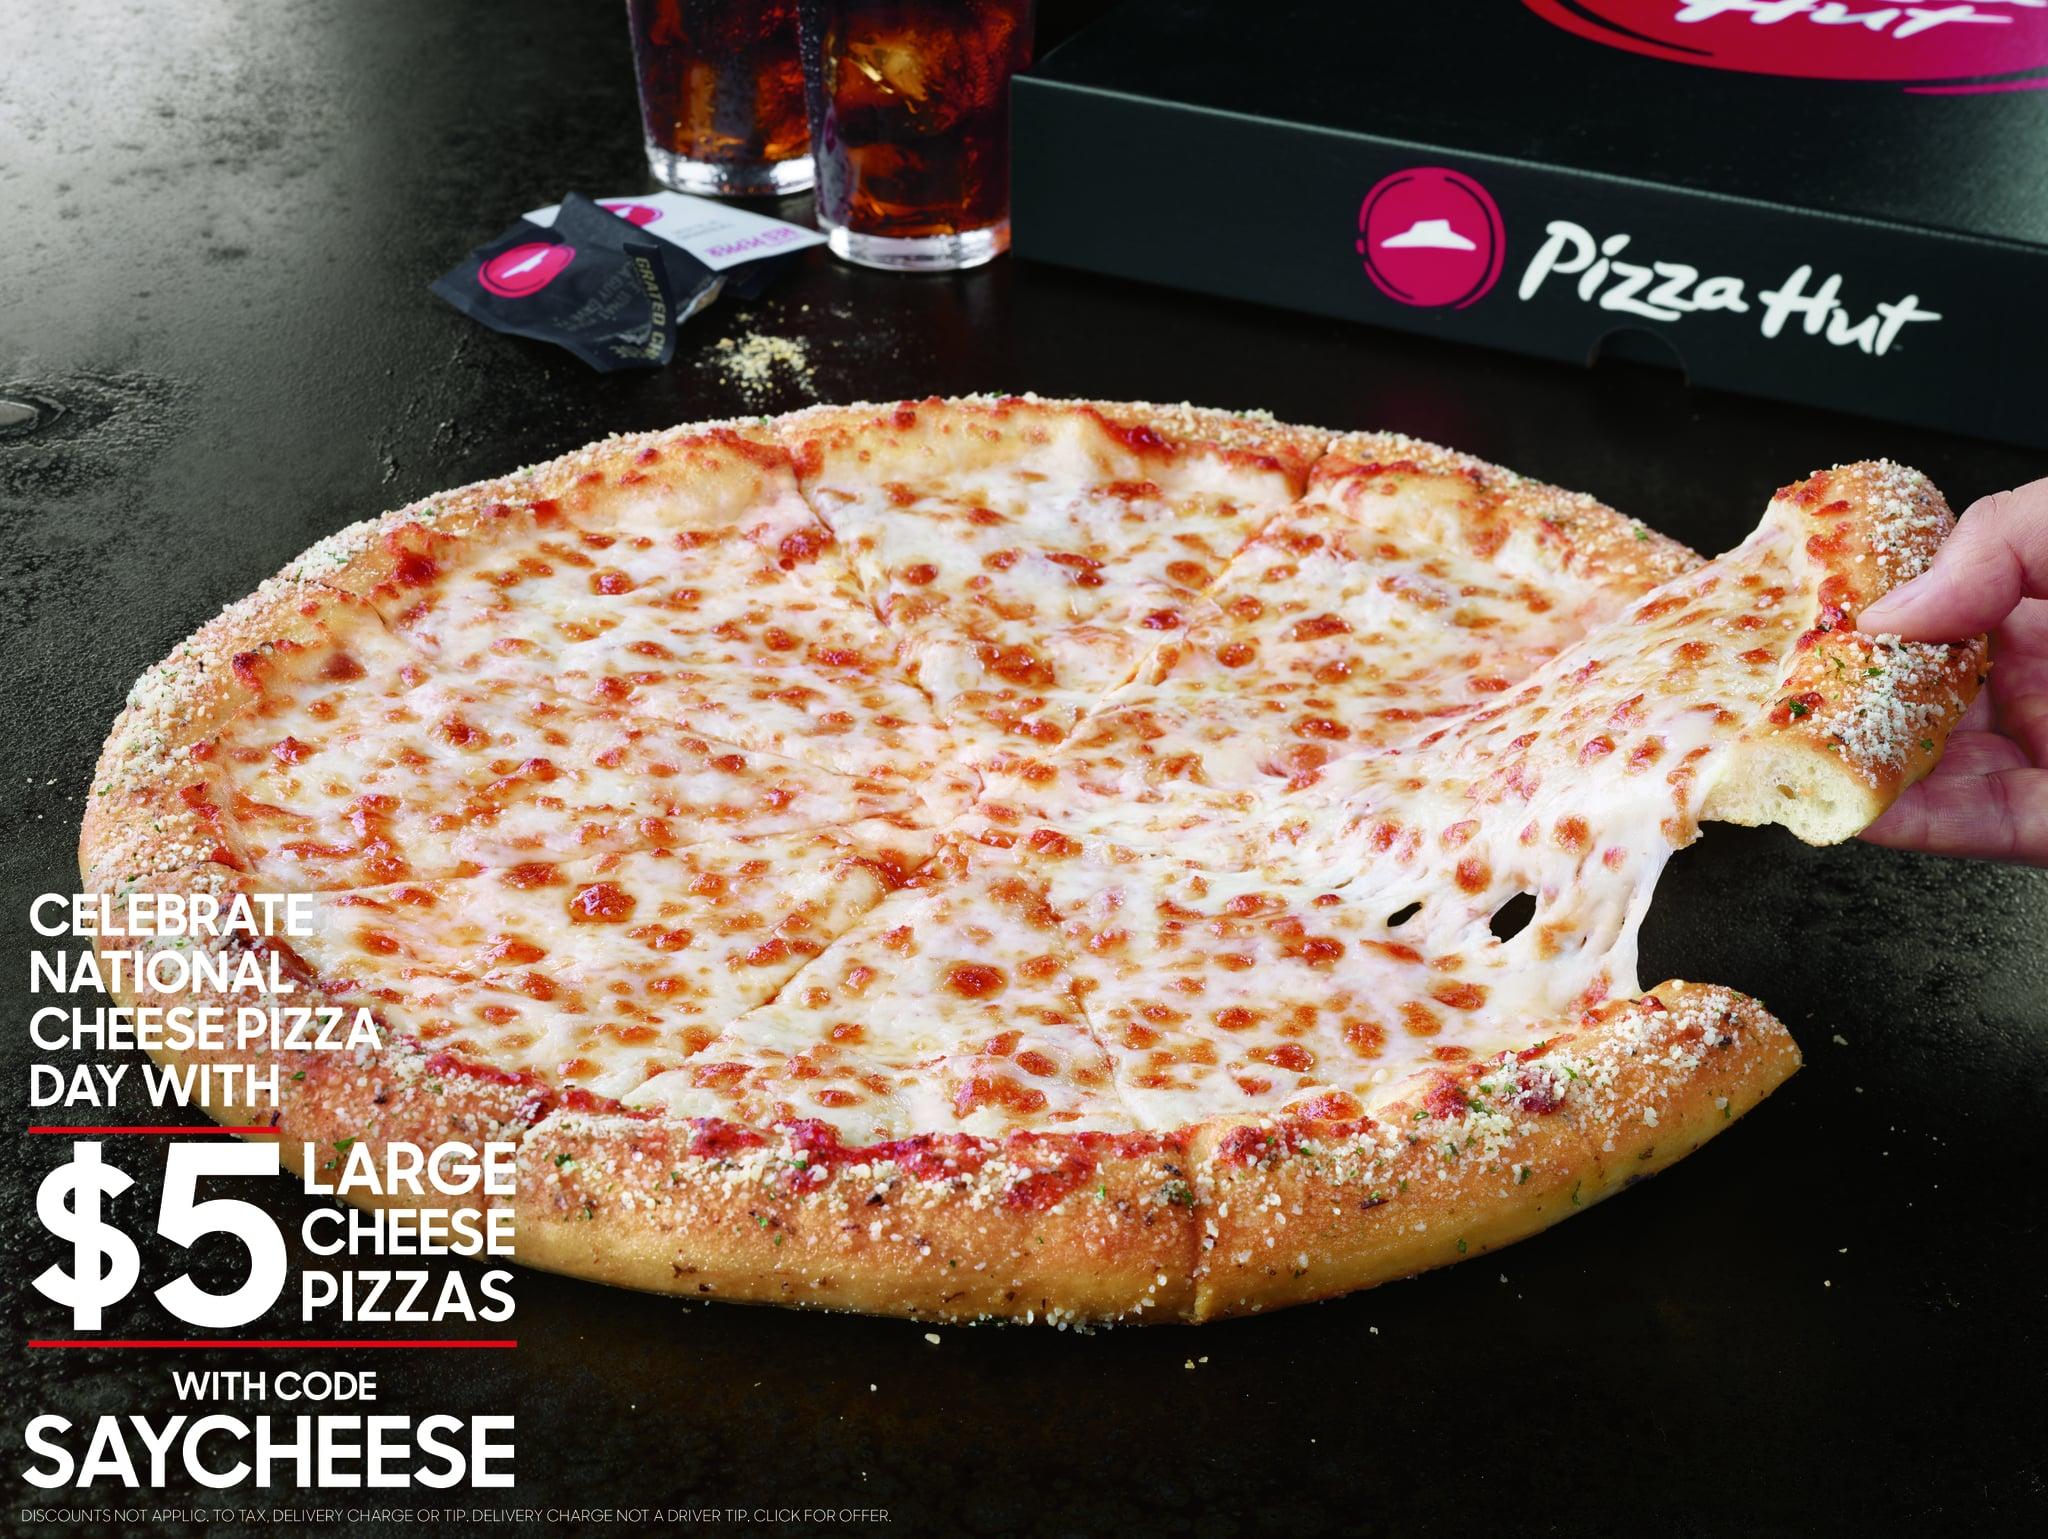 source pizza hut